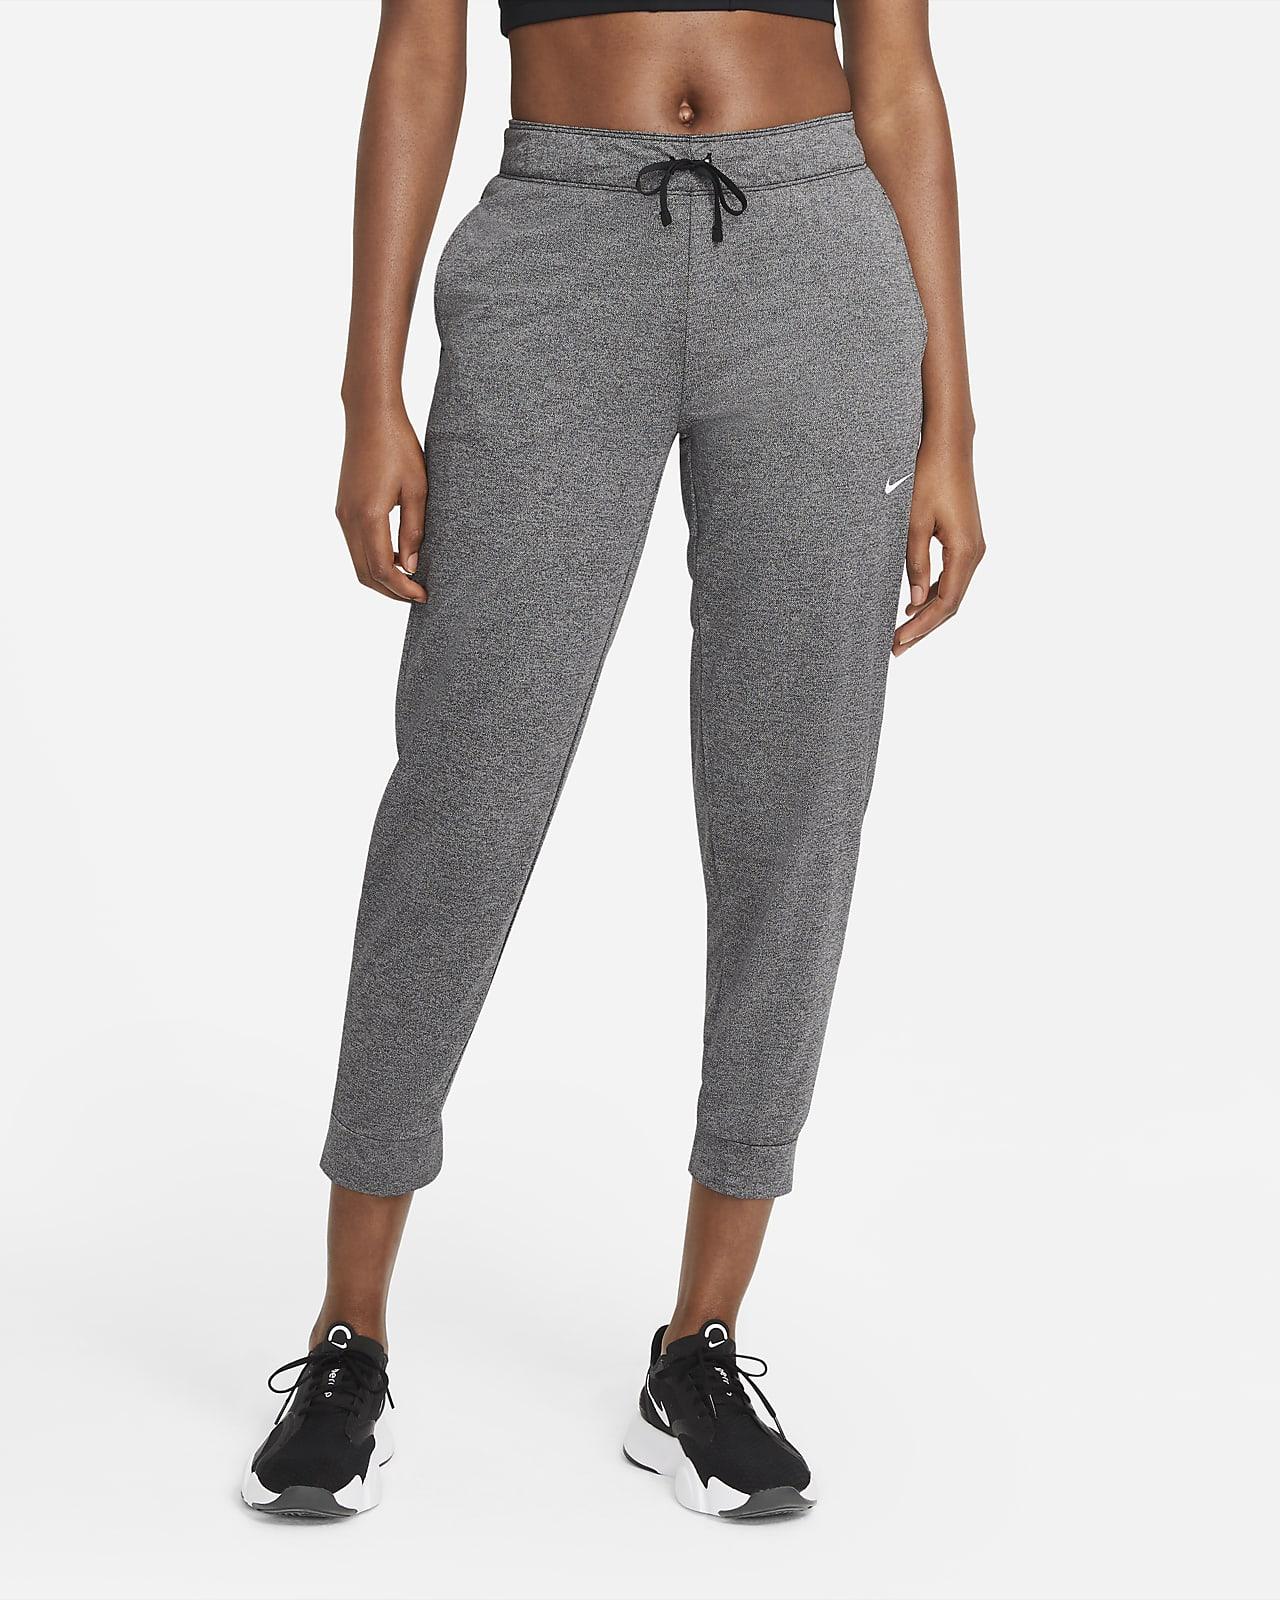 Nike Attack Women's 7/8 Training Pants